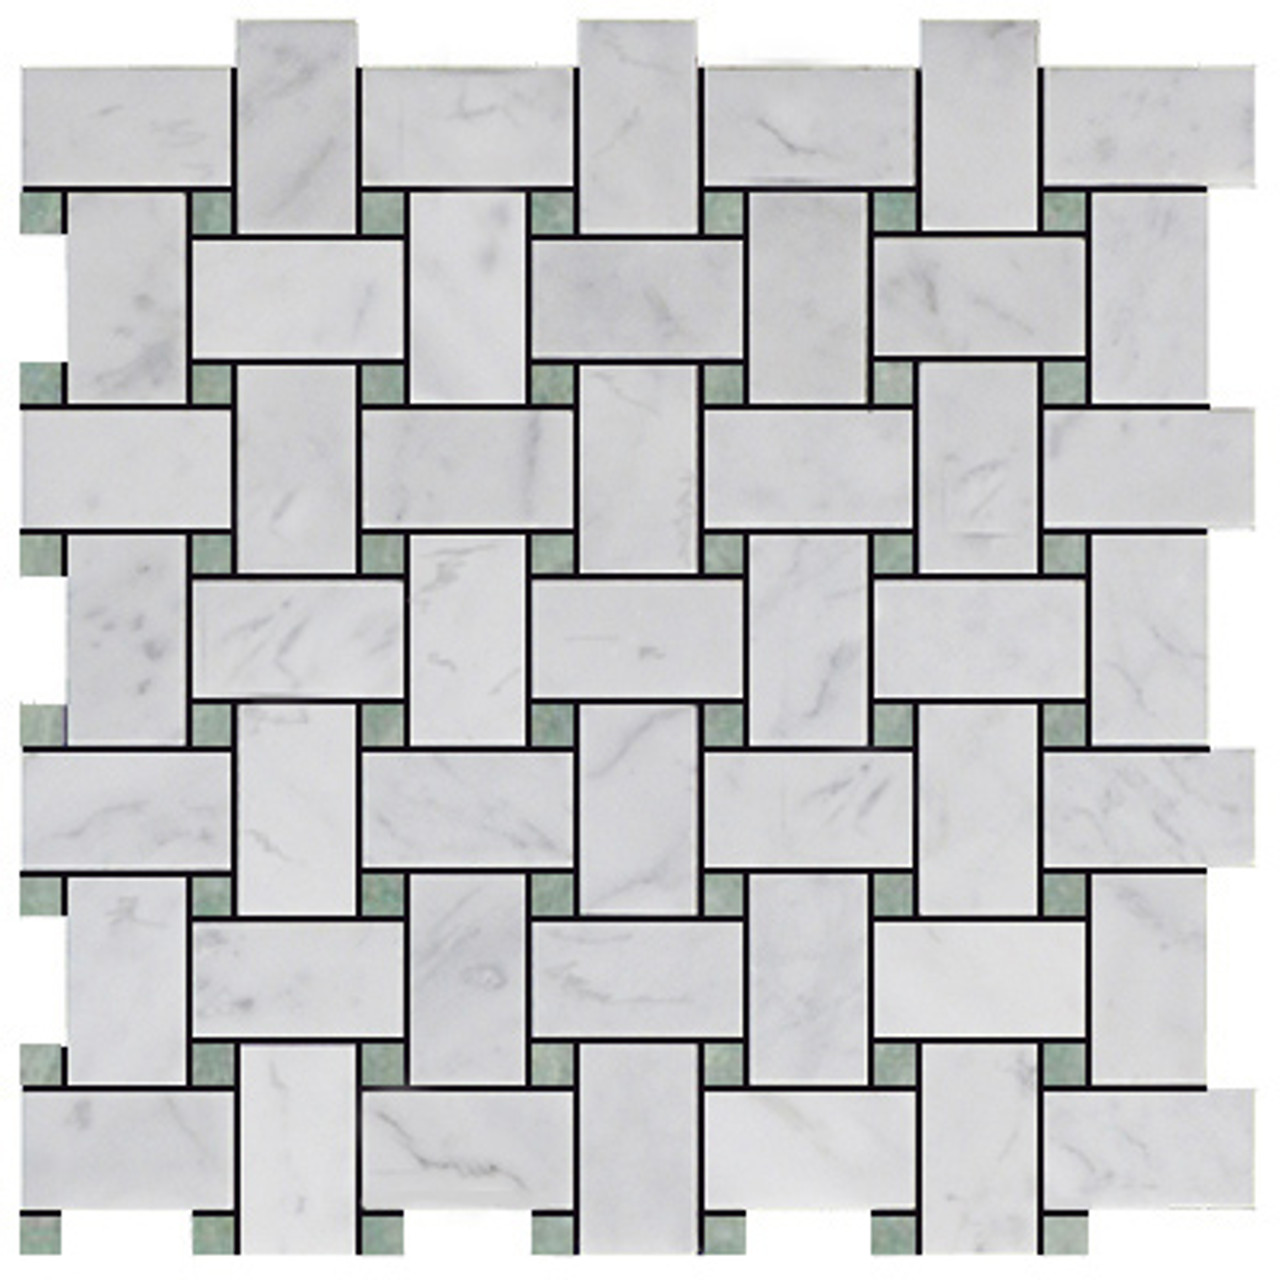 carrara white italian marble basketweave mosaic tile with green dots honed